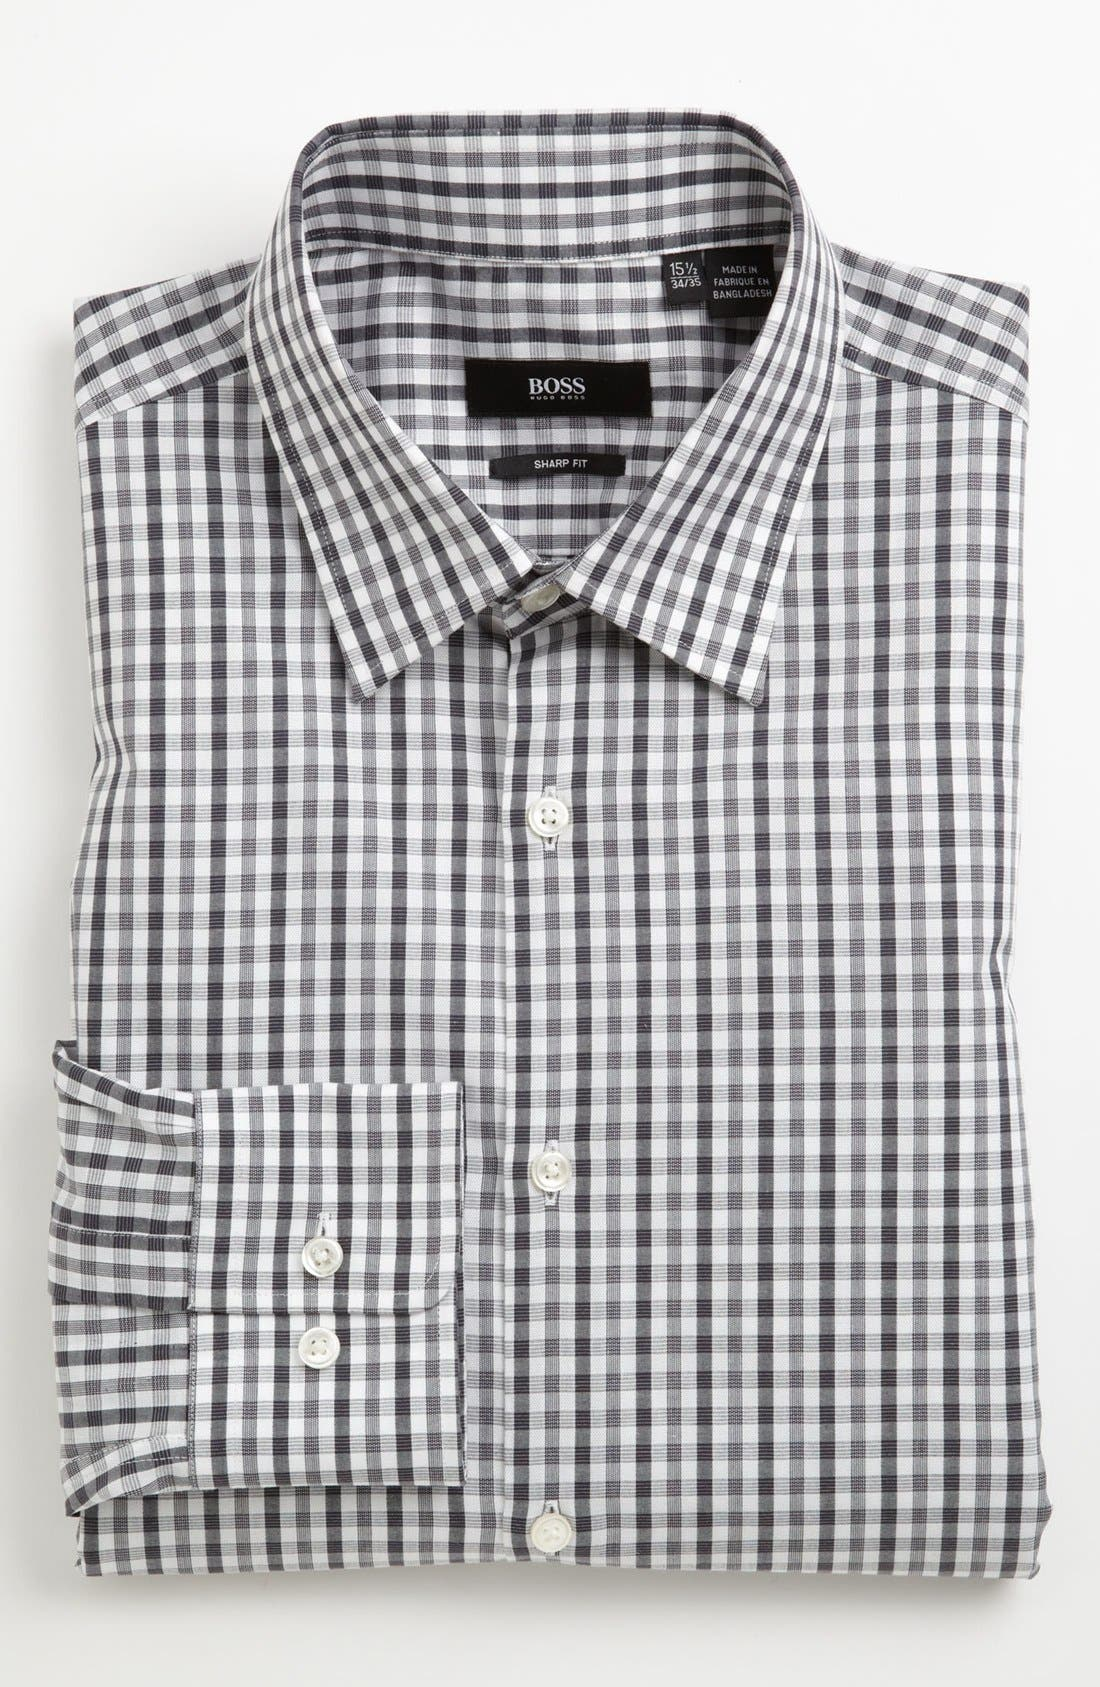 Main Image - BOSS HUGO BOSS Sharp Fit Dress Shirt